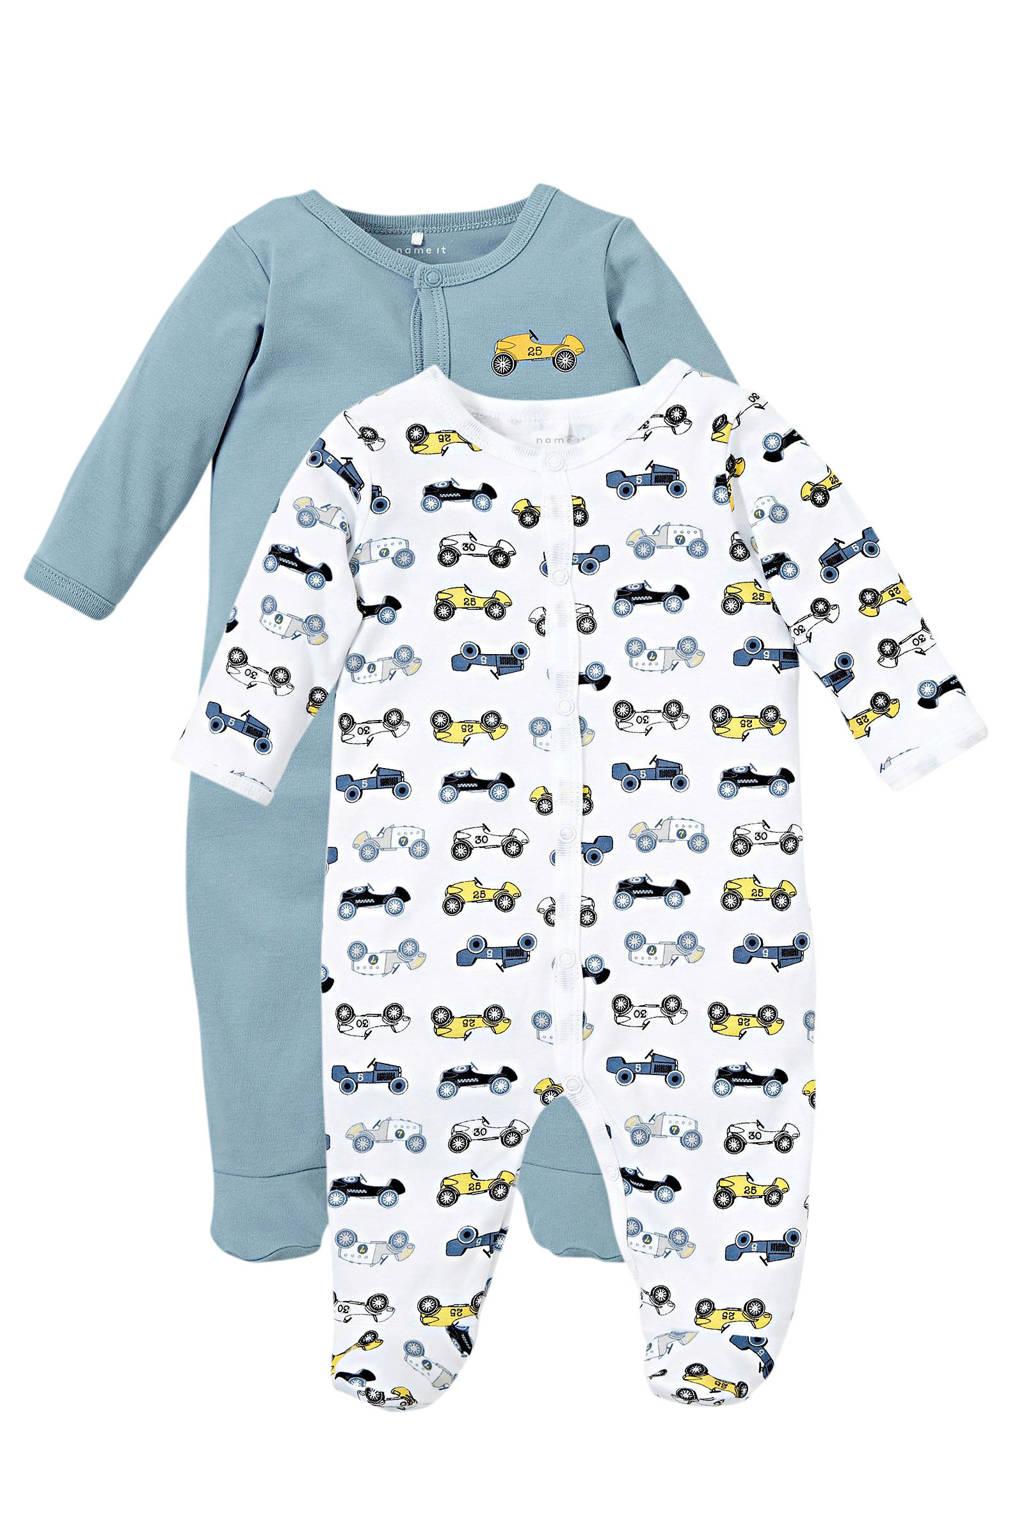 NAME IT BABY baby boxpak - (set van 1), Blauw/wit/geel